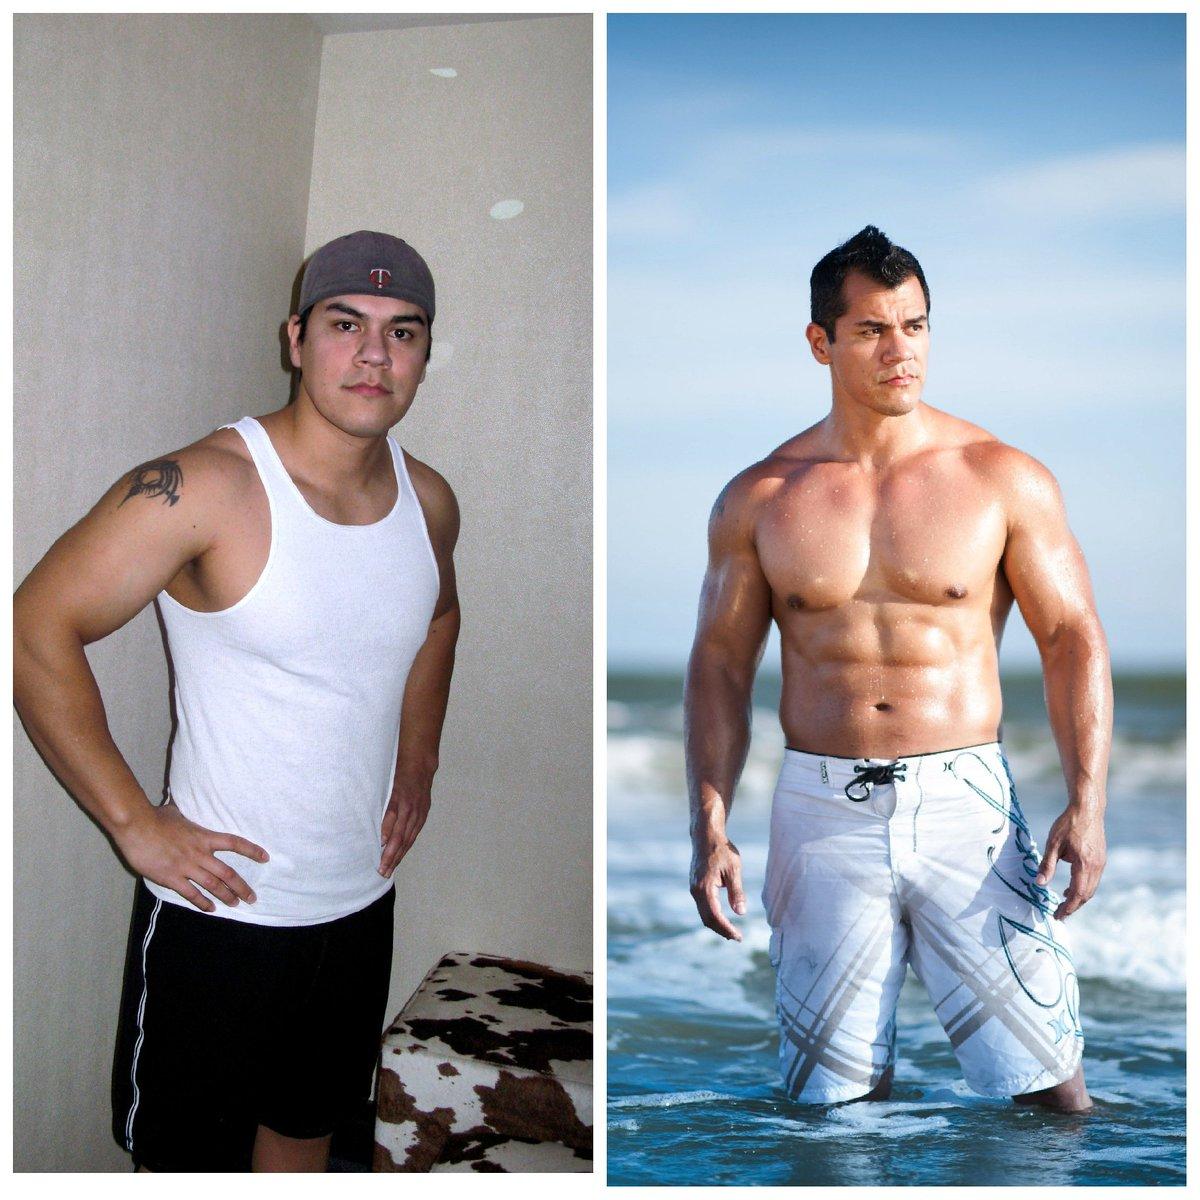 #TuesdayMotivation @hurley #Hulk #TransformationTuesday #gymtime #goldsgym #musclebeach #ActorsLife #jessejames #rollinsw0llen #BuildYourBody #Venice #Nike #evogennutrition #fitness #harbinger #evogenelite #TuesdayMotivation #iconmeals #harbingerfitness #gymrat #hurley